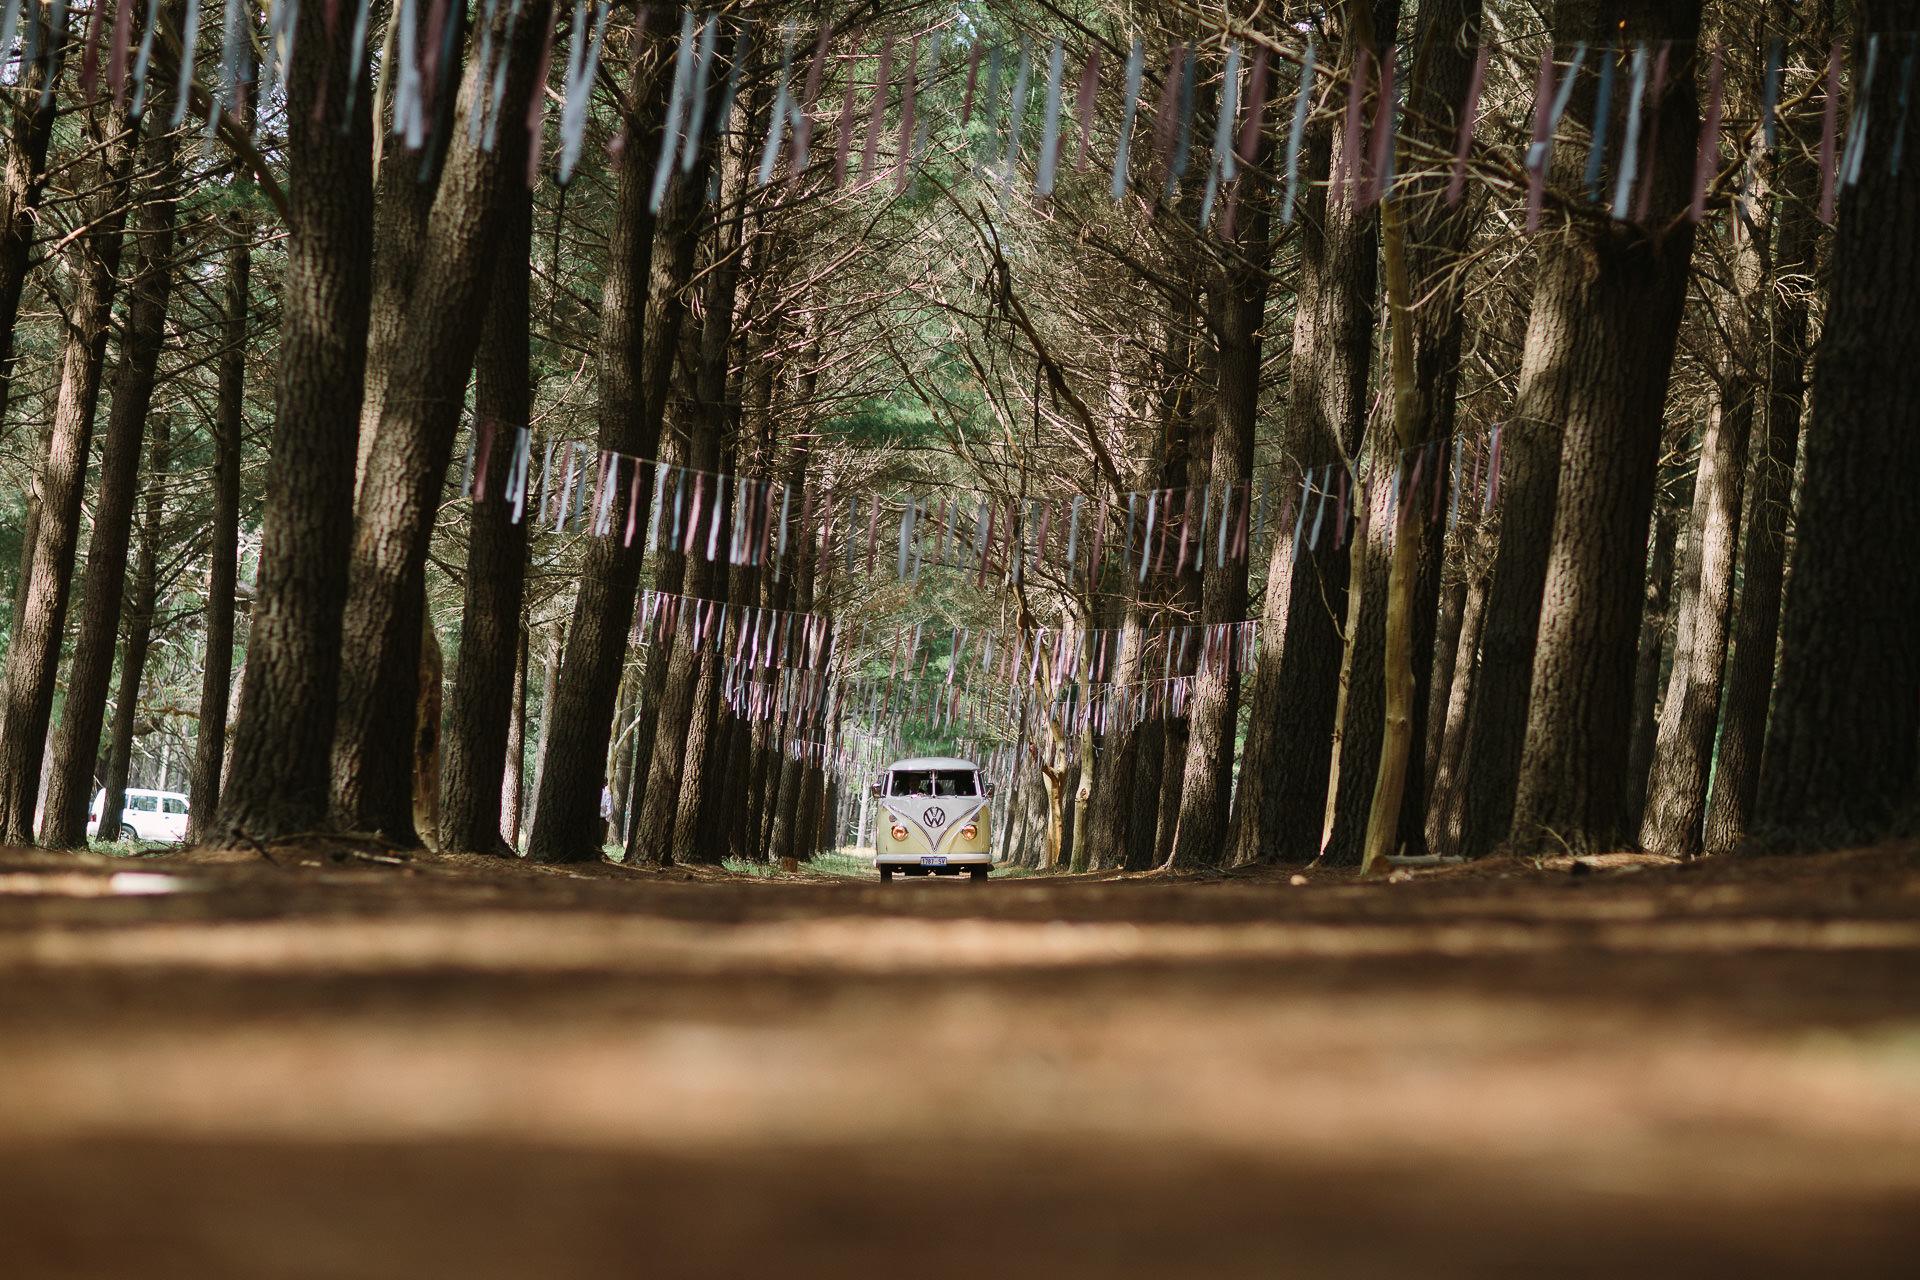 Kombi van arriving at wedding in Kuitpo forest Adelaide